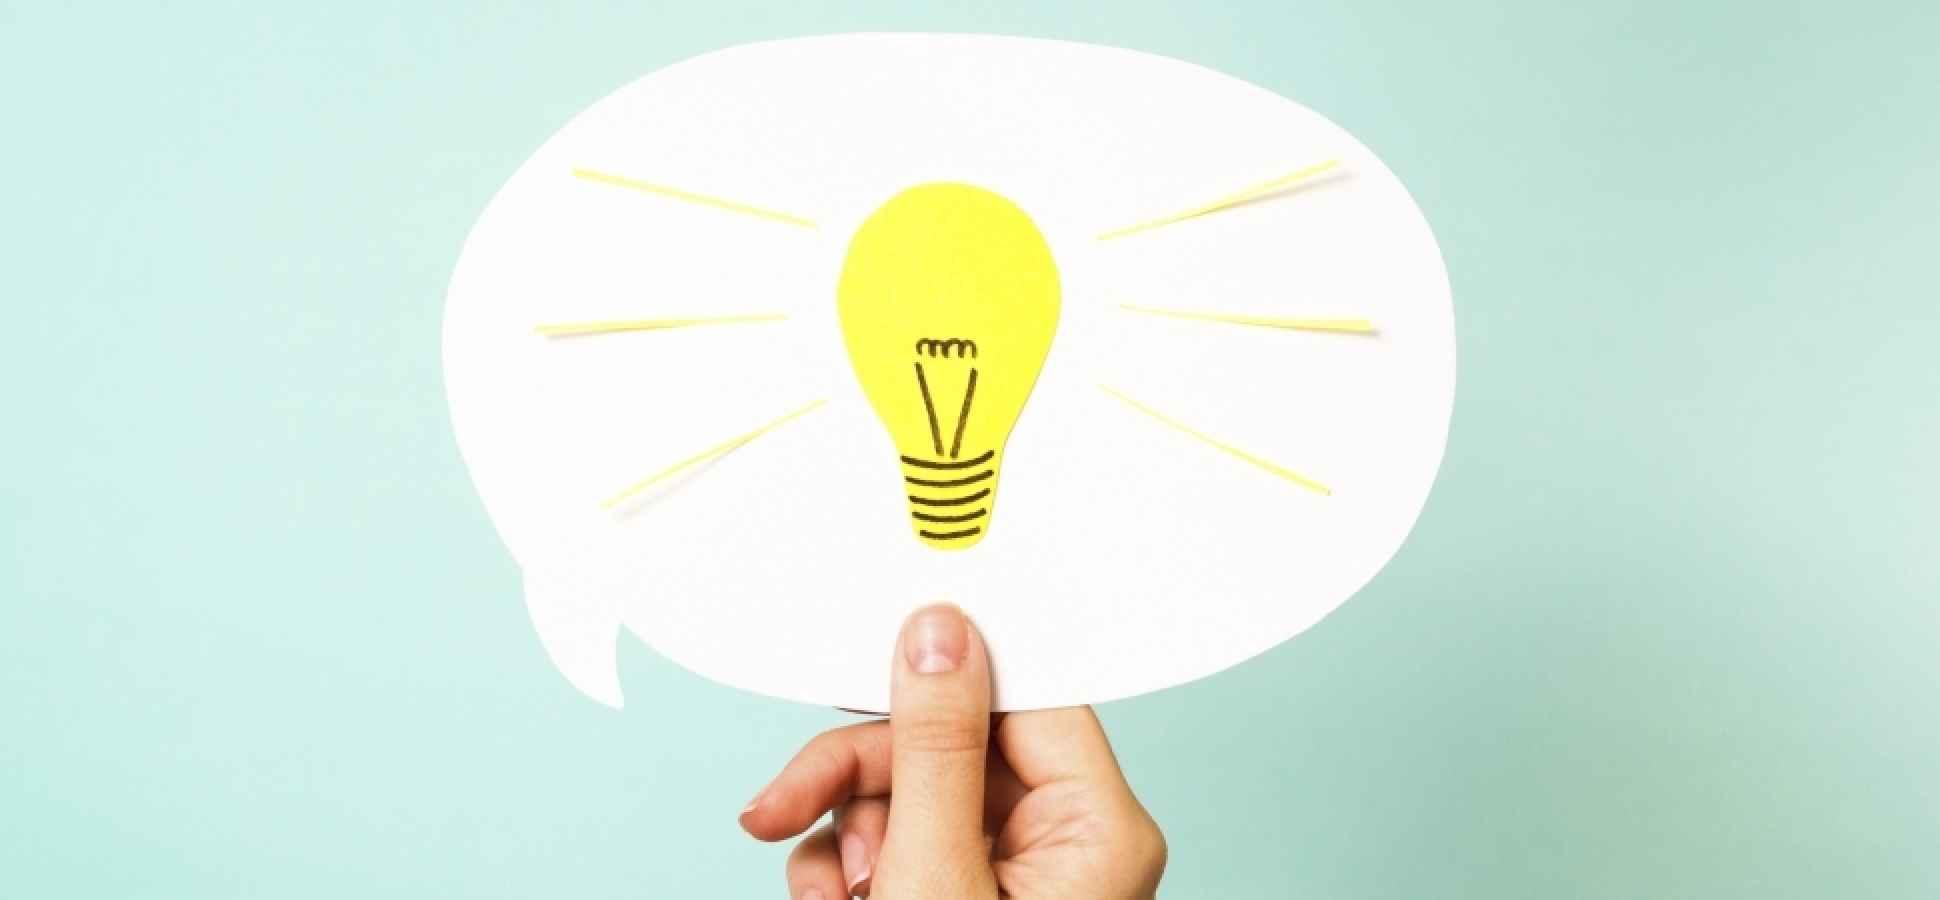 Can a Test Determine Your Aptitude for Entrepreneurship?